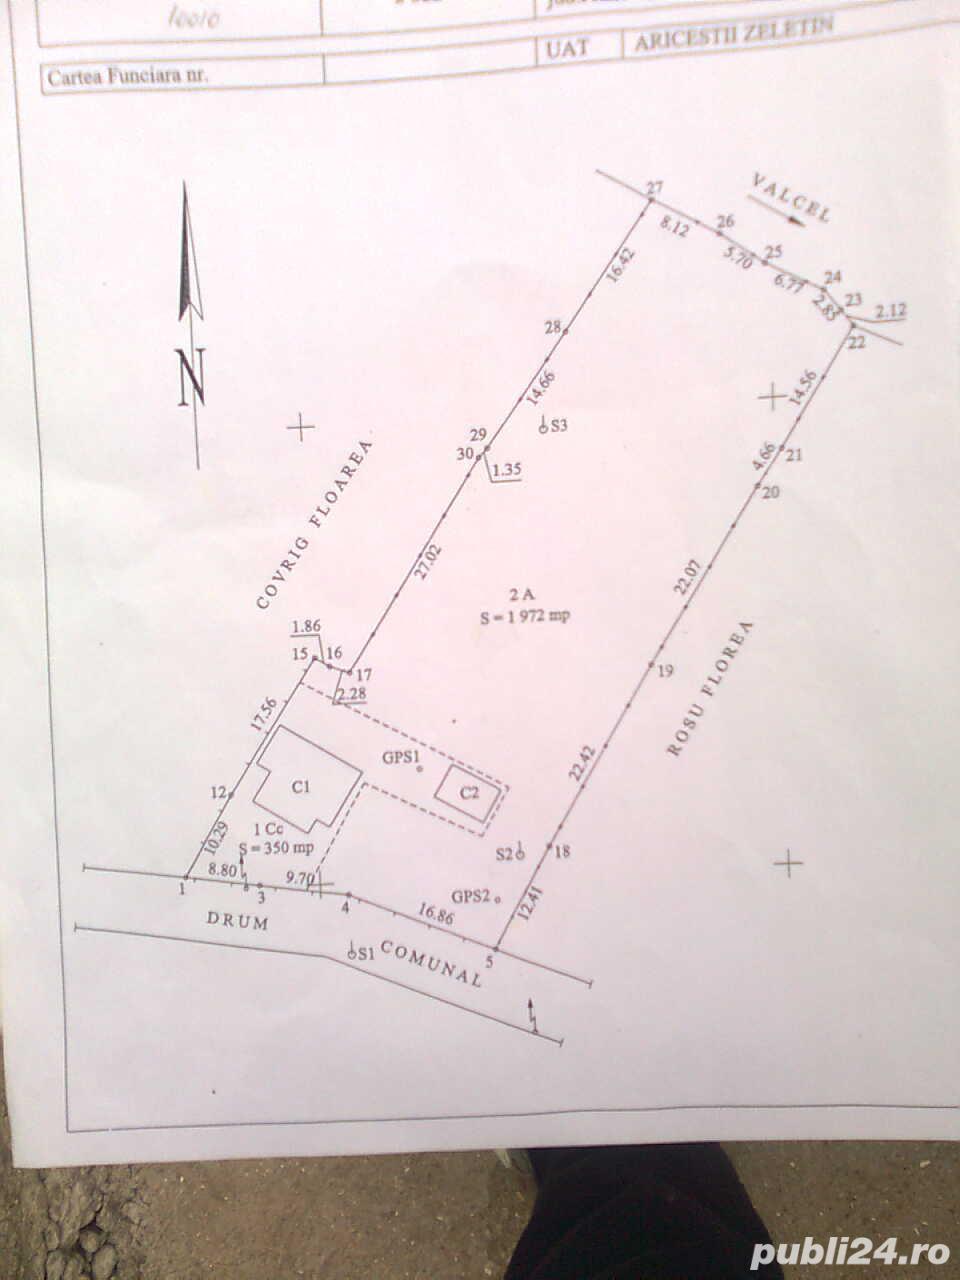 schimb/ vand  casa /vila de vacanta zona valenii-de-munte cu garsoniera/apartament bucuresti/litoral